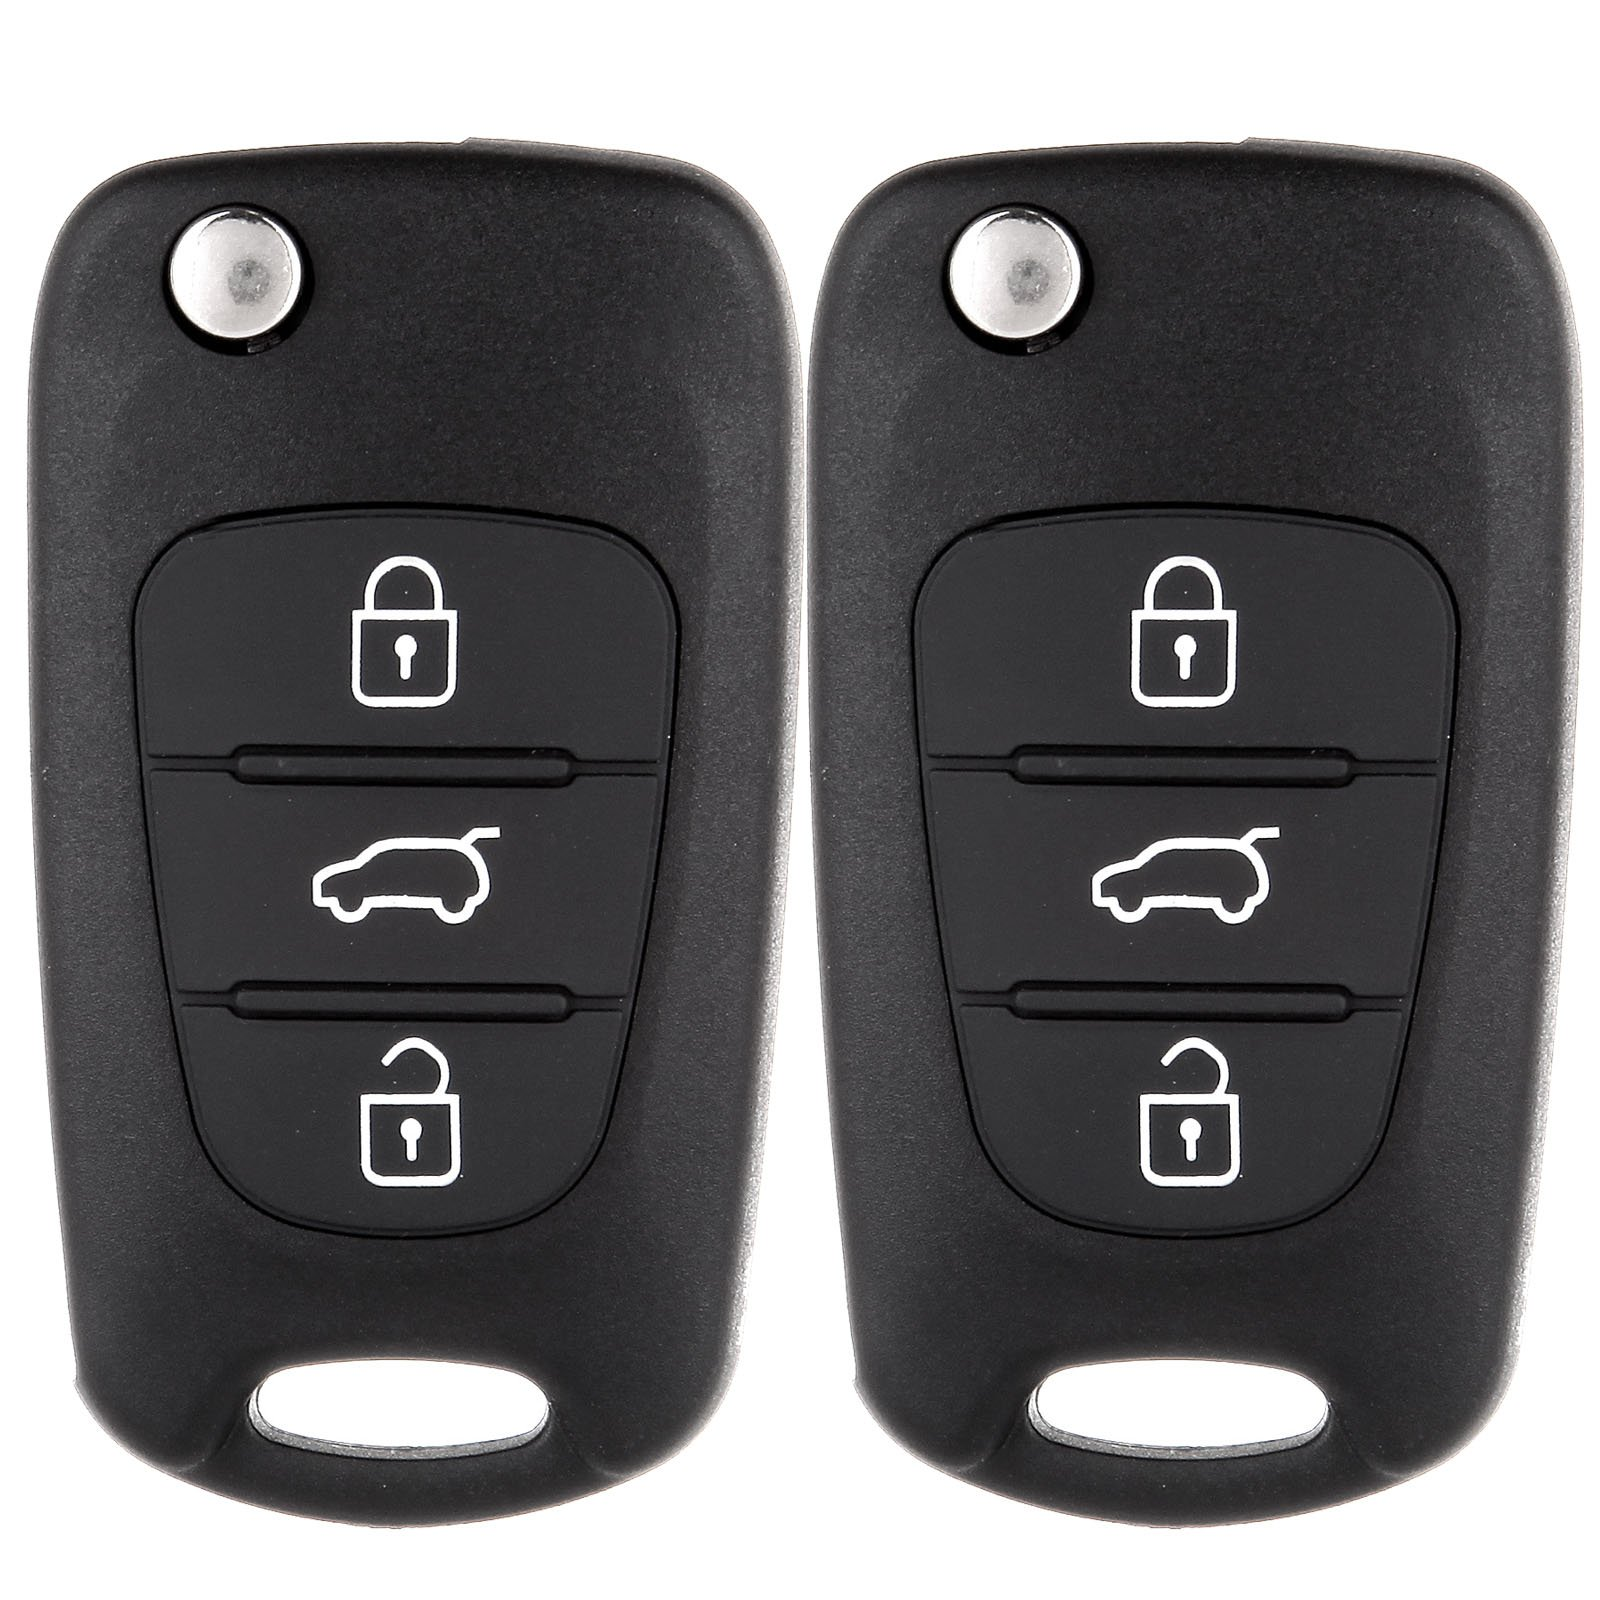 ECCPP 2X 3 Button Replacement Uncut Keyless Entry Remote Control Car Key Fob Shell Case for Kia Rio/Rondo/ Soul/Sportage